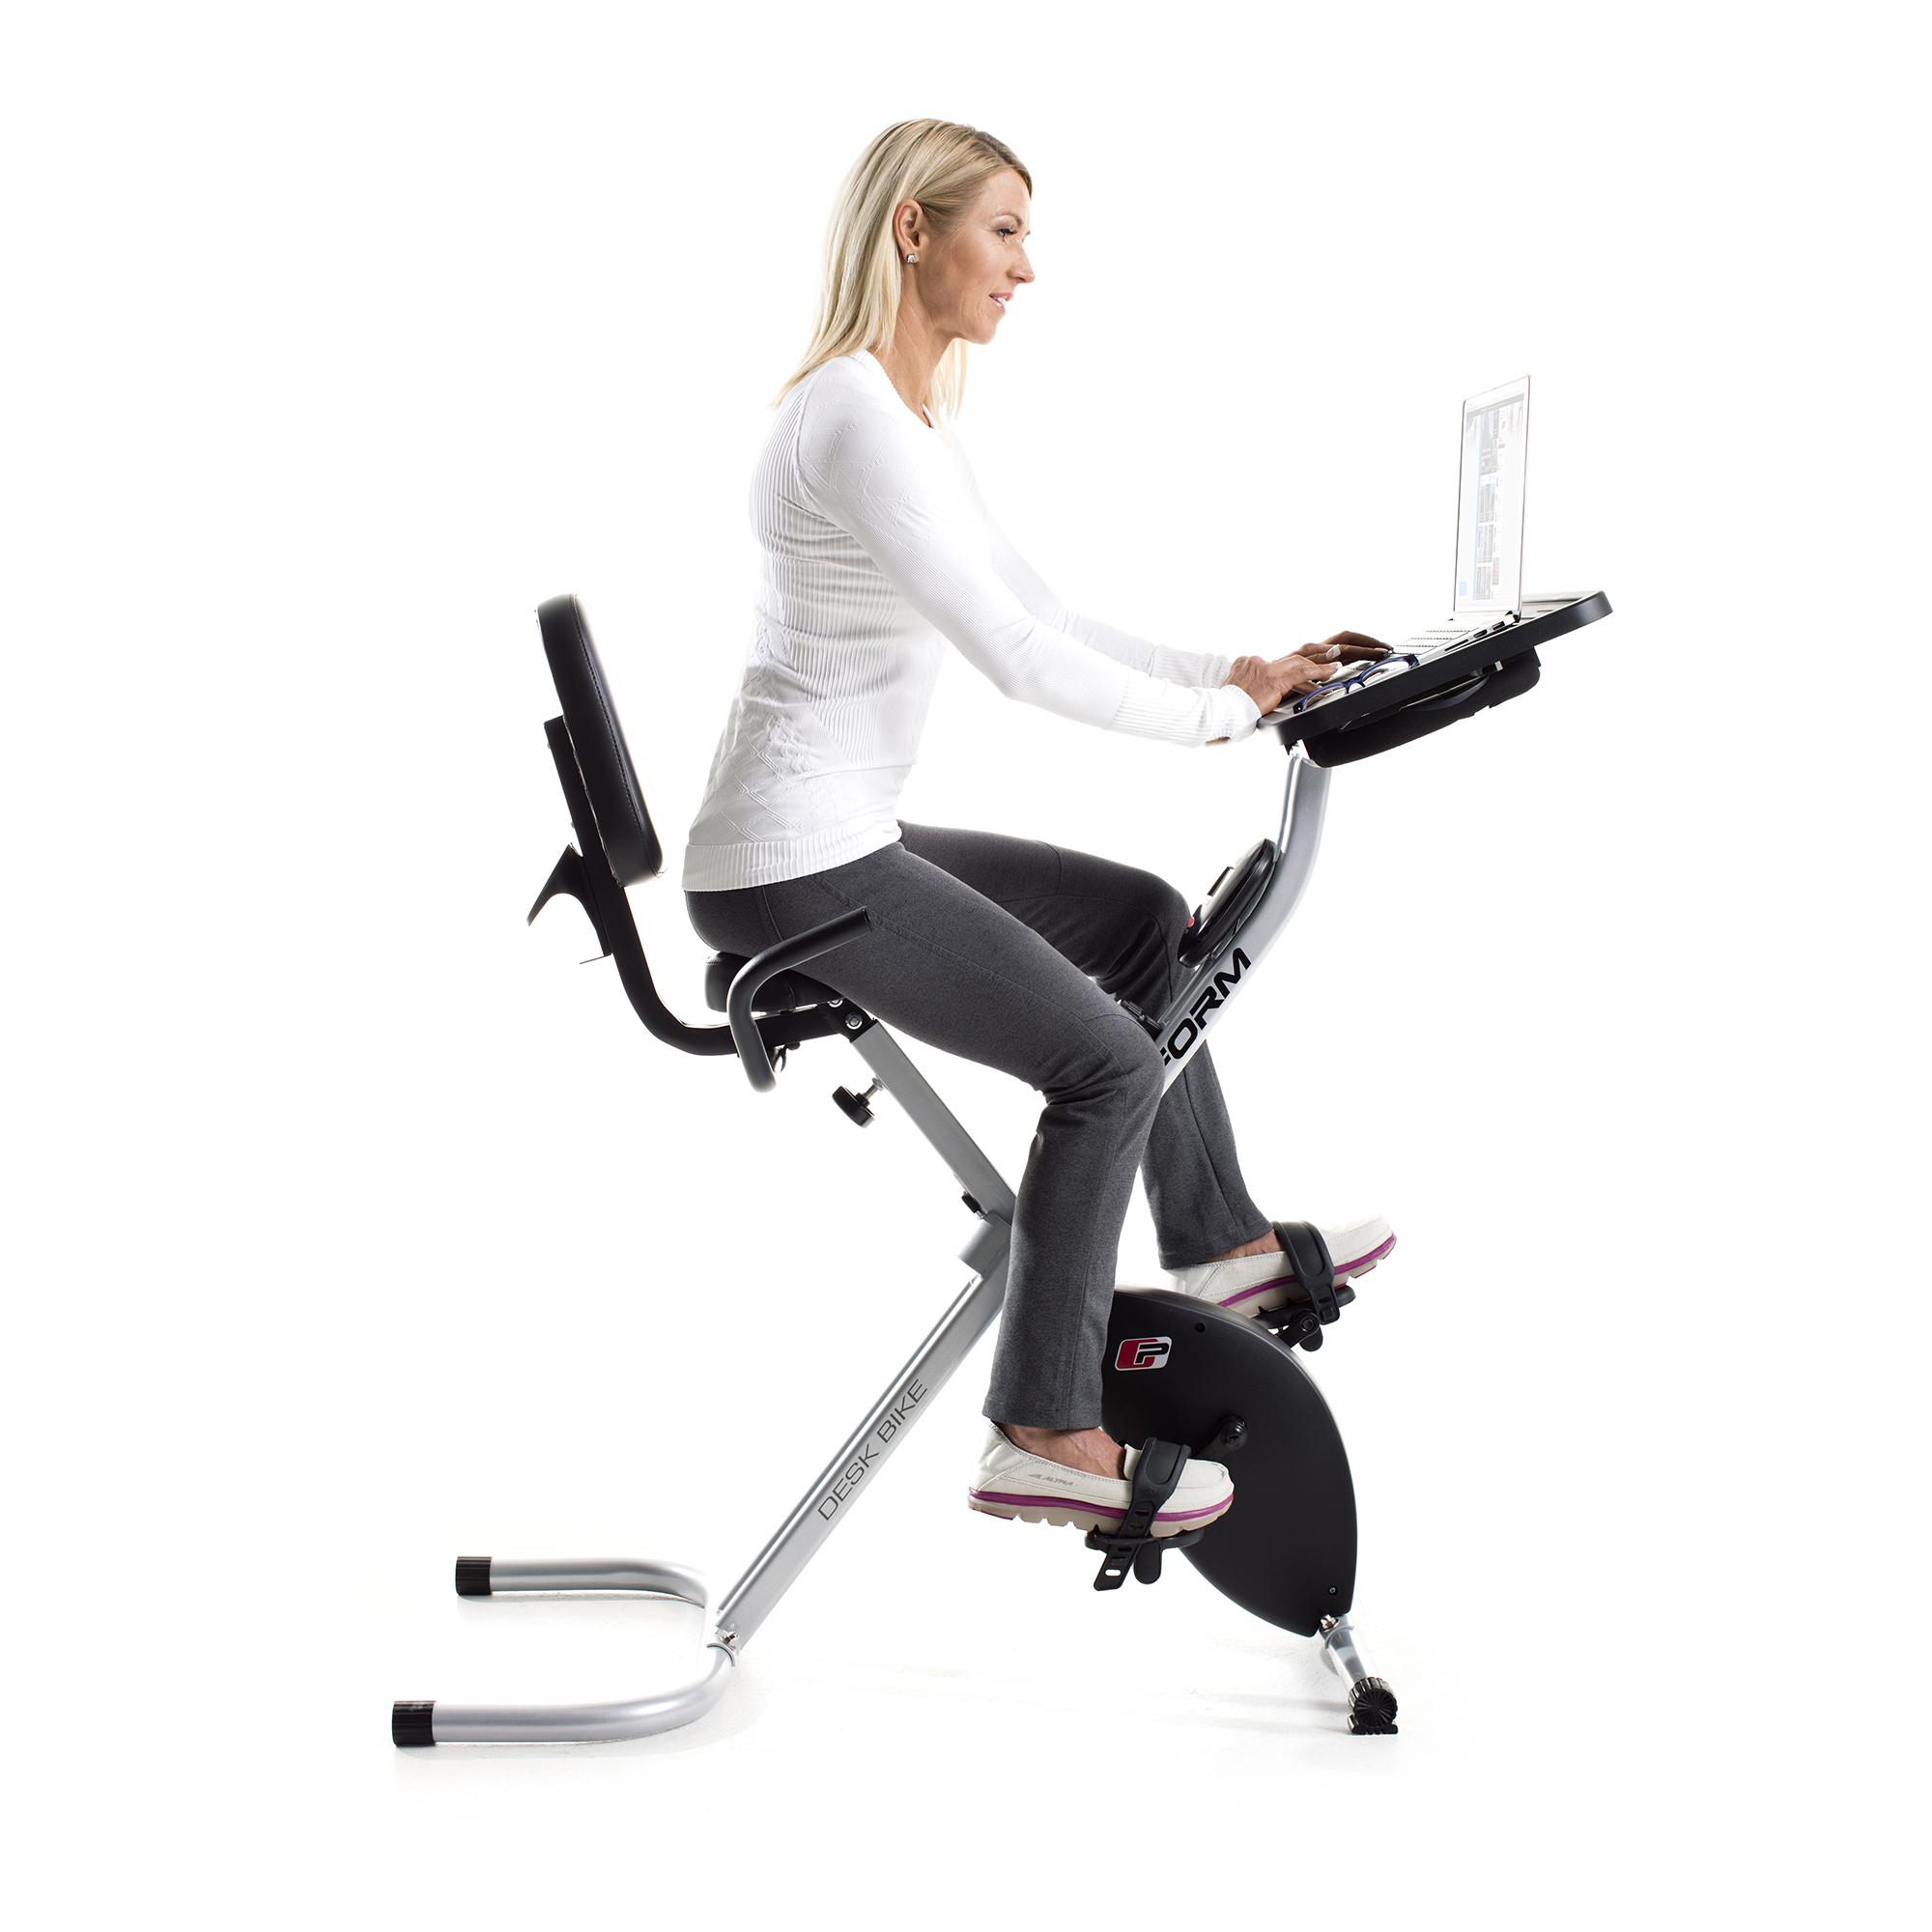 Proform Foldable Portable Stationary Fitness Desk Exercise